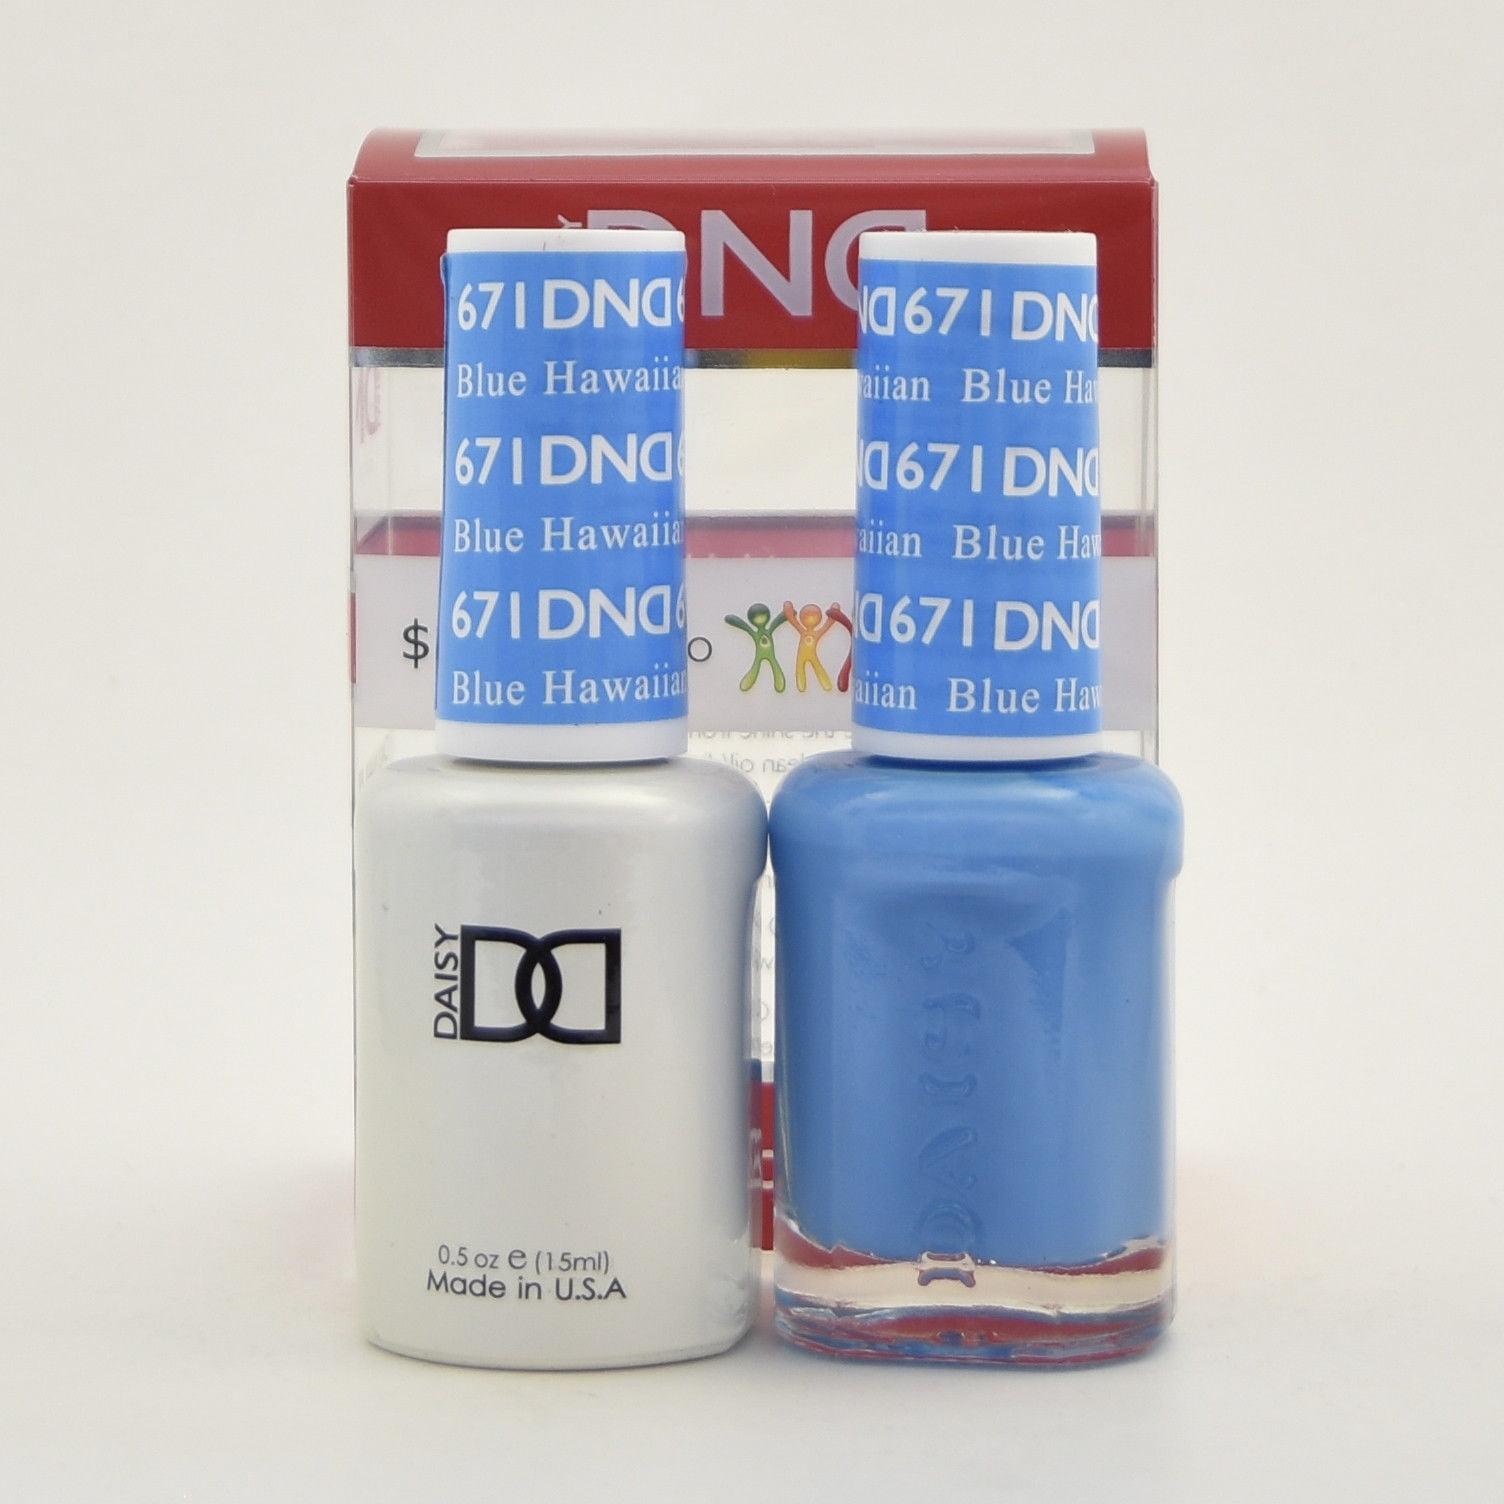 Walmart Gel Polish: DND Duo Nail Gel Polish 671 Blue Hawaiian